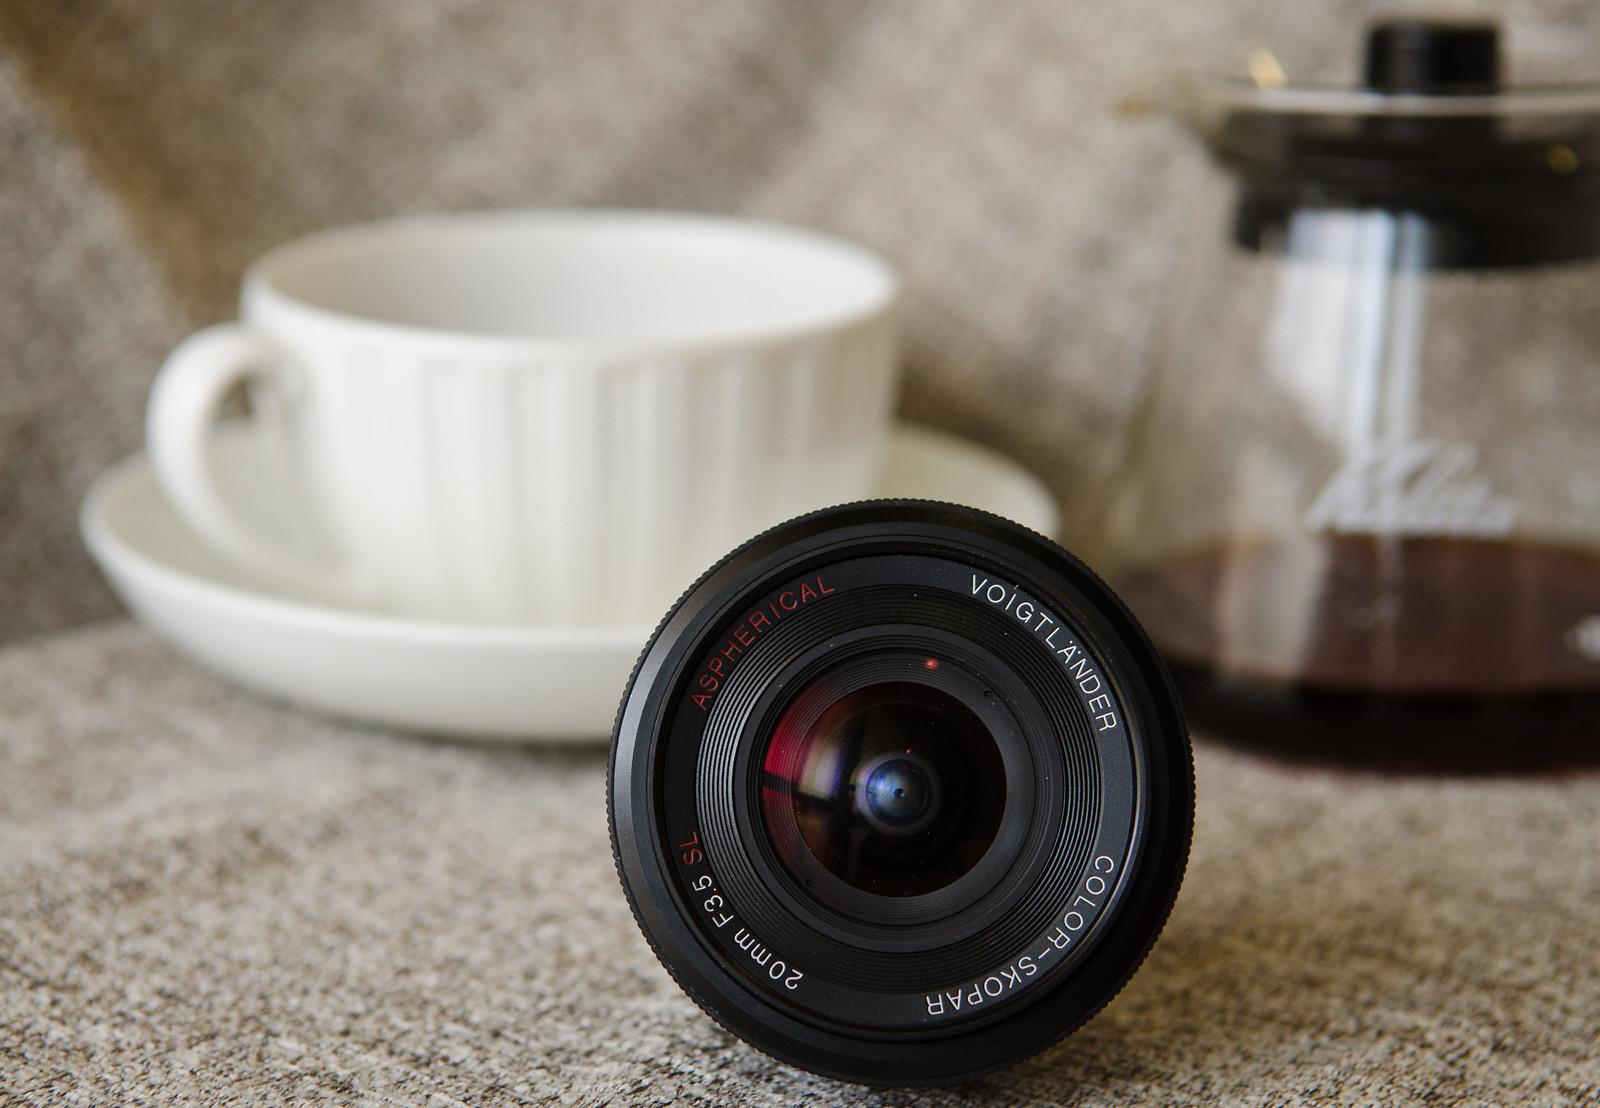 Voigtlander Lens + Coffee